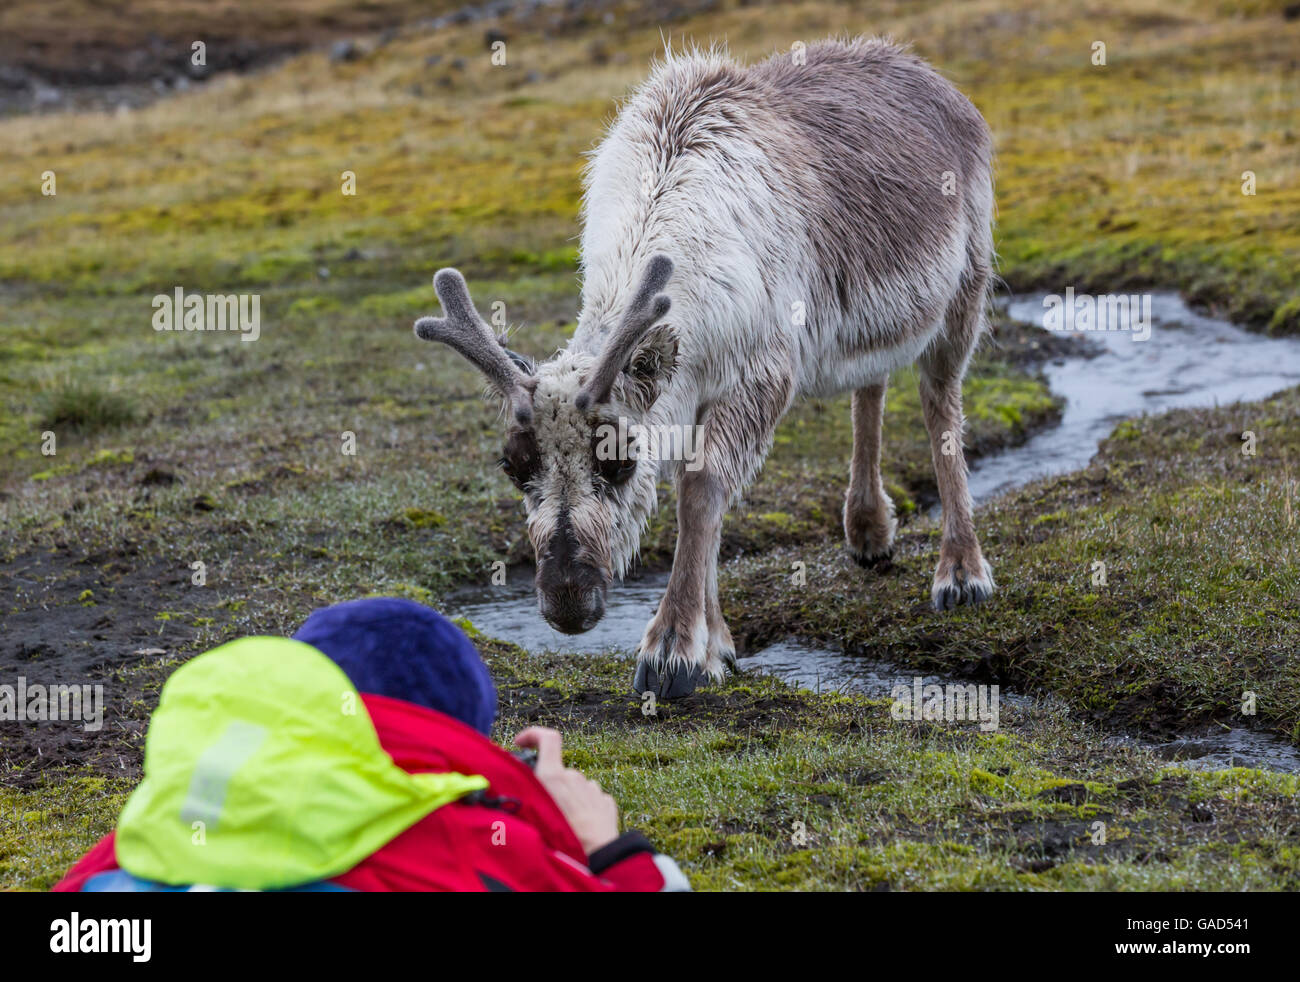 Fearless reindeer makes close approach to wildlife photographer at Alkhornet, Ijsfjorden, Spitsbergen, Norway - Stock Image